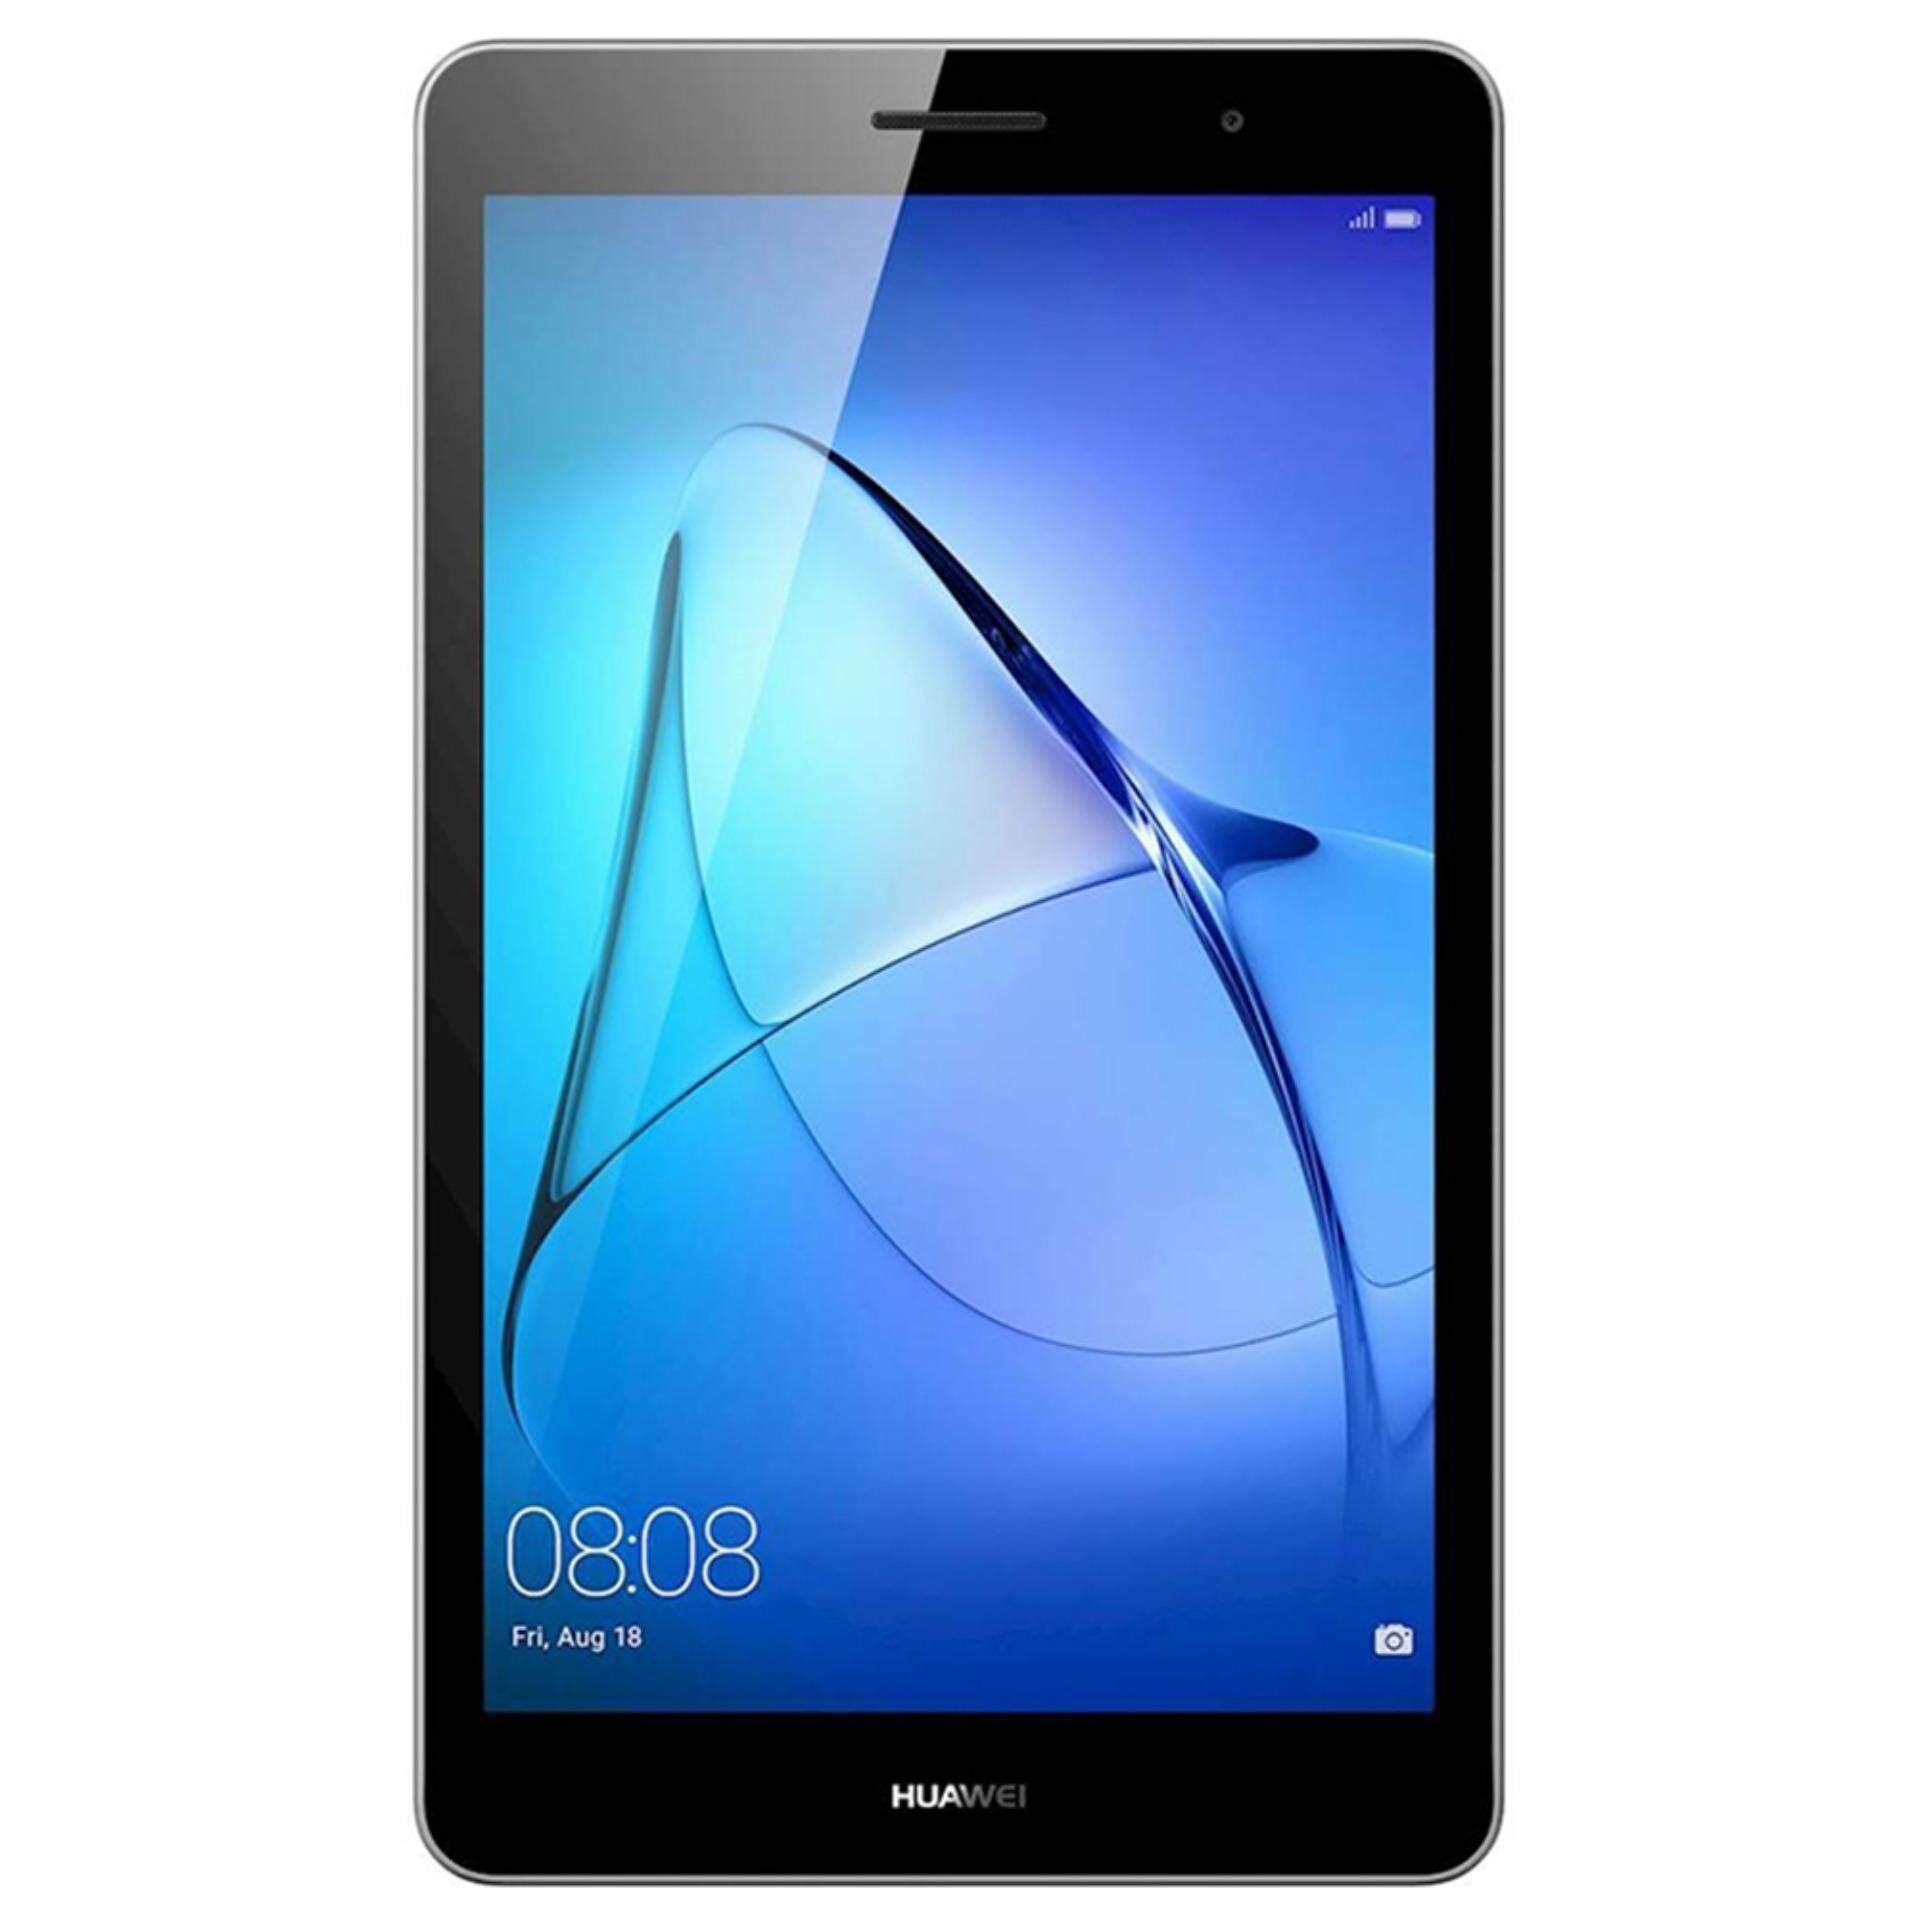 HUAWEI MediaPad T3 8″ KOB-W09 Wifi 2G+16G Quad core Wifi 2G+16G 5MP+2MP